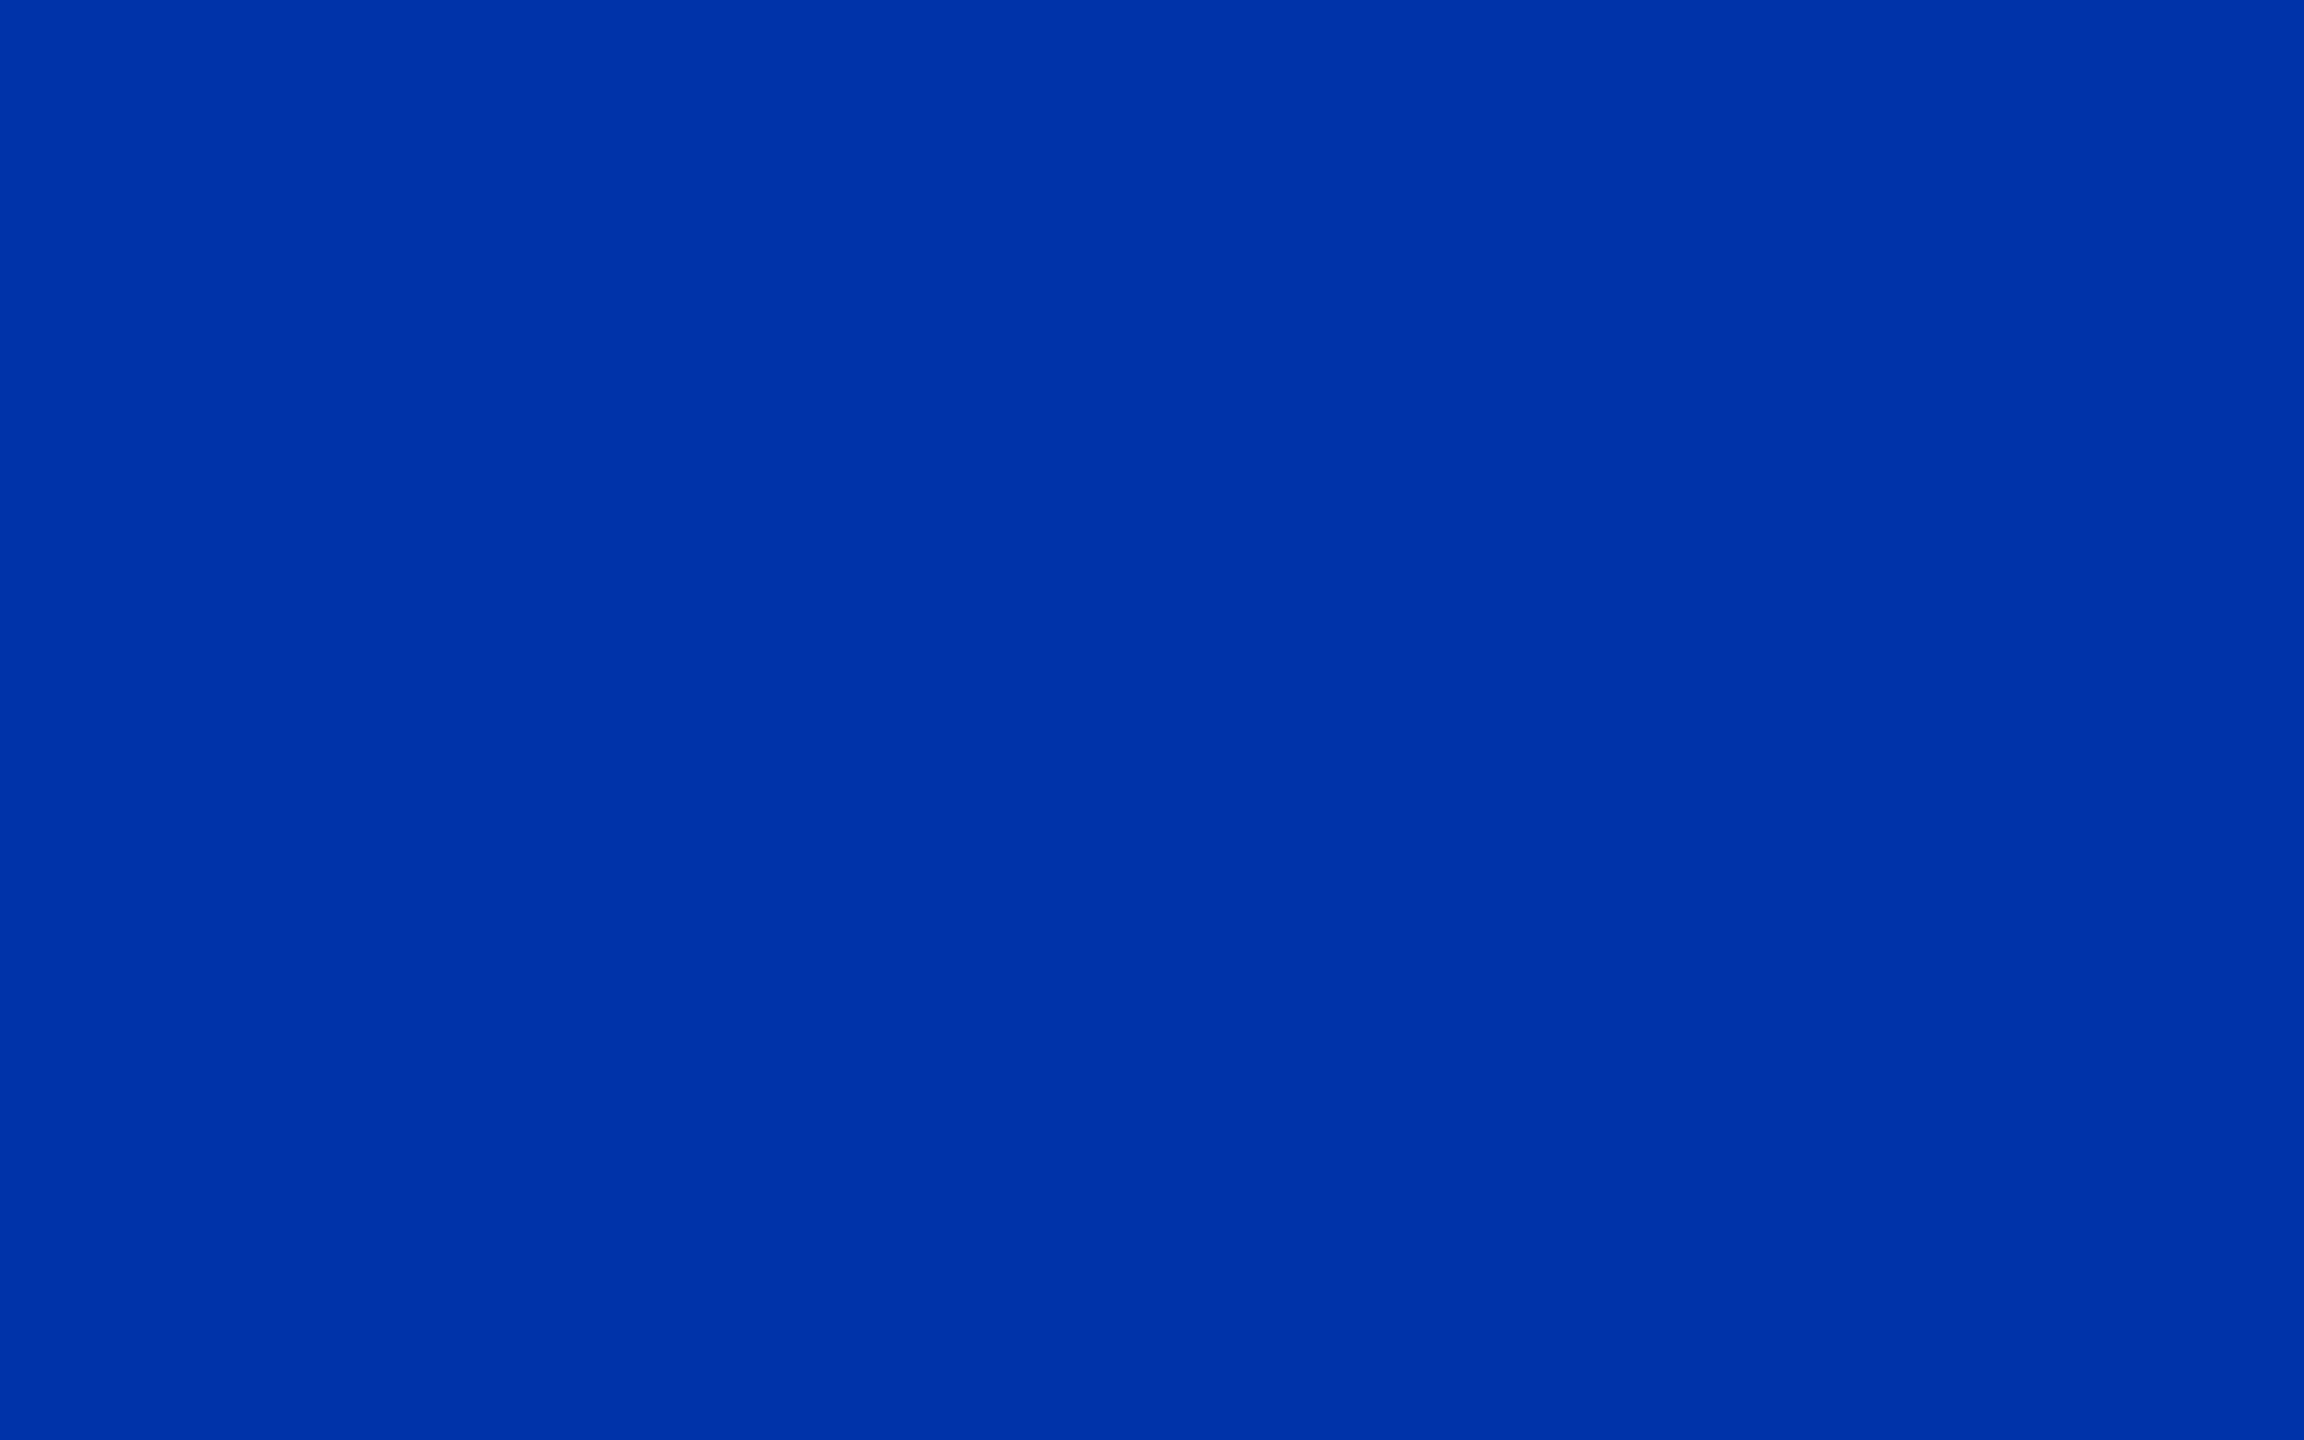 2304x1440 UA Blue Solid Color Background